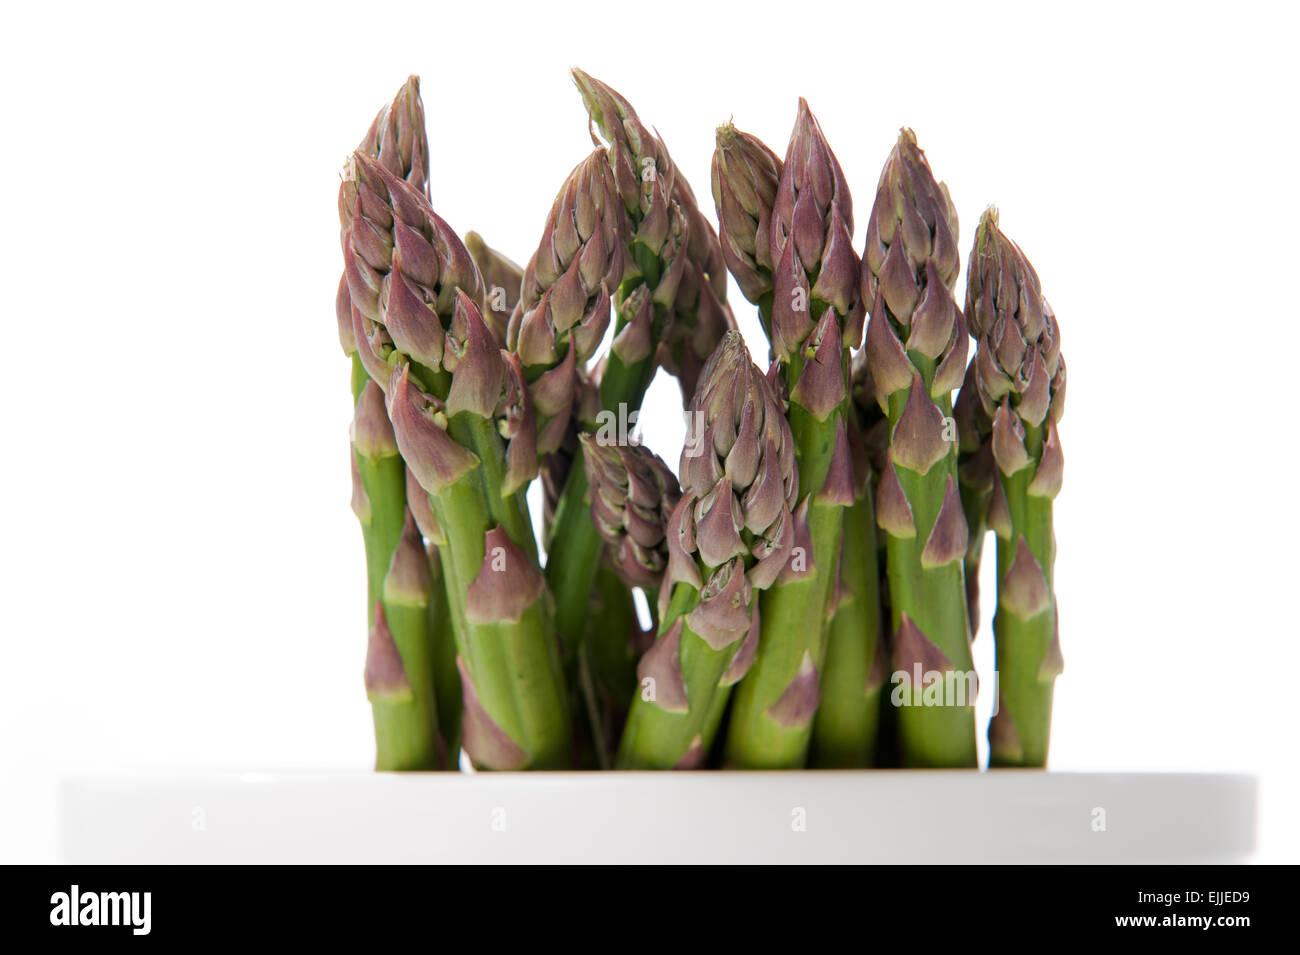 Bund gruener Spargel studiofoto   Bunch of Green Asparagus studio shot - Stock Image